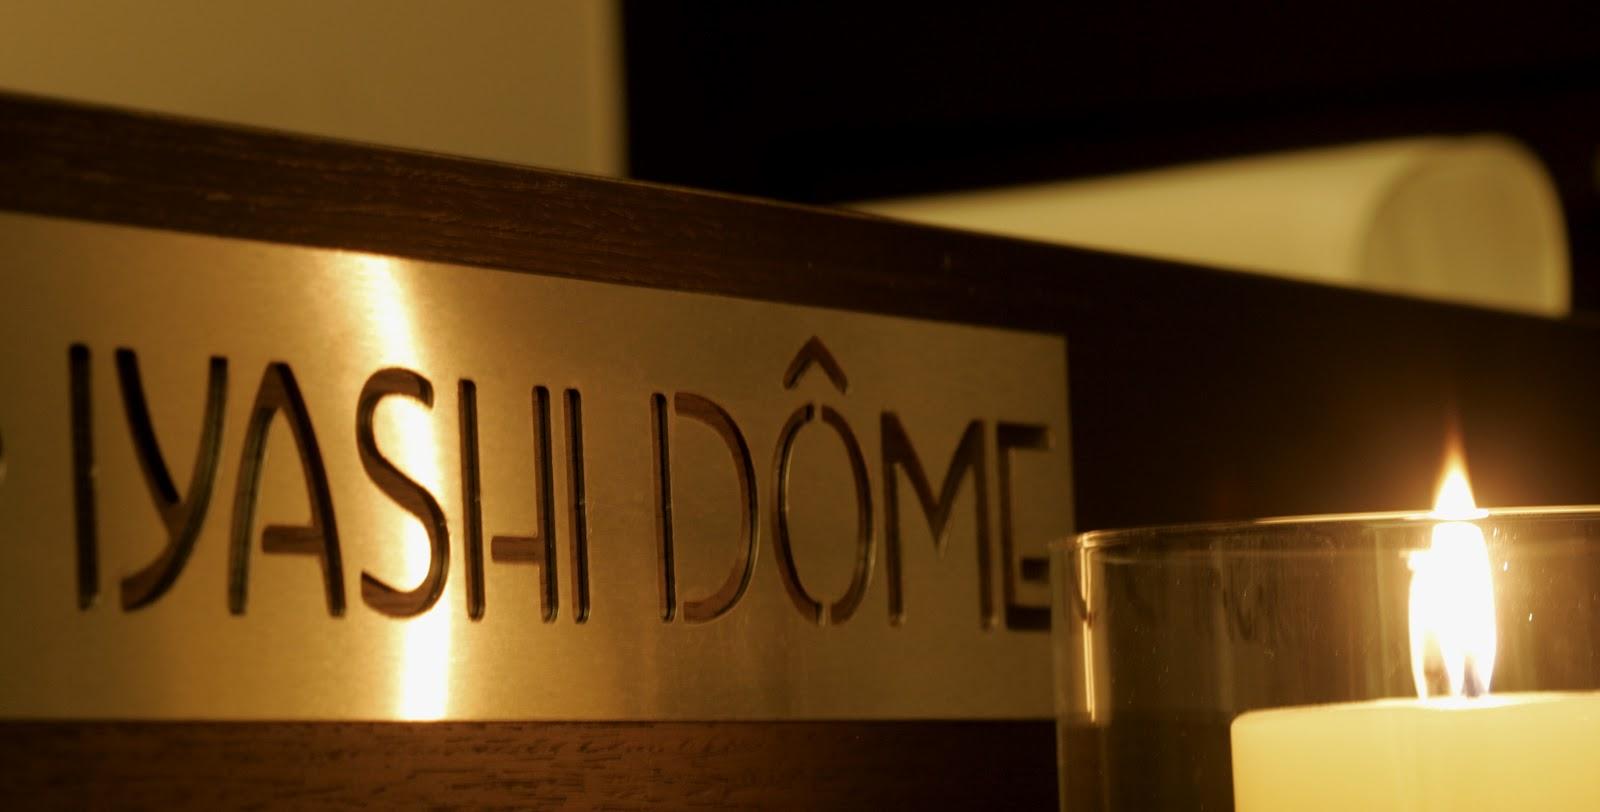 iyashi dome (13)